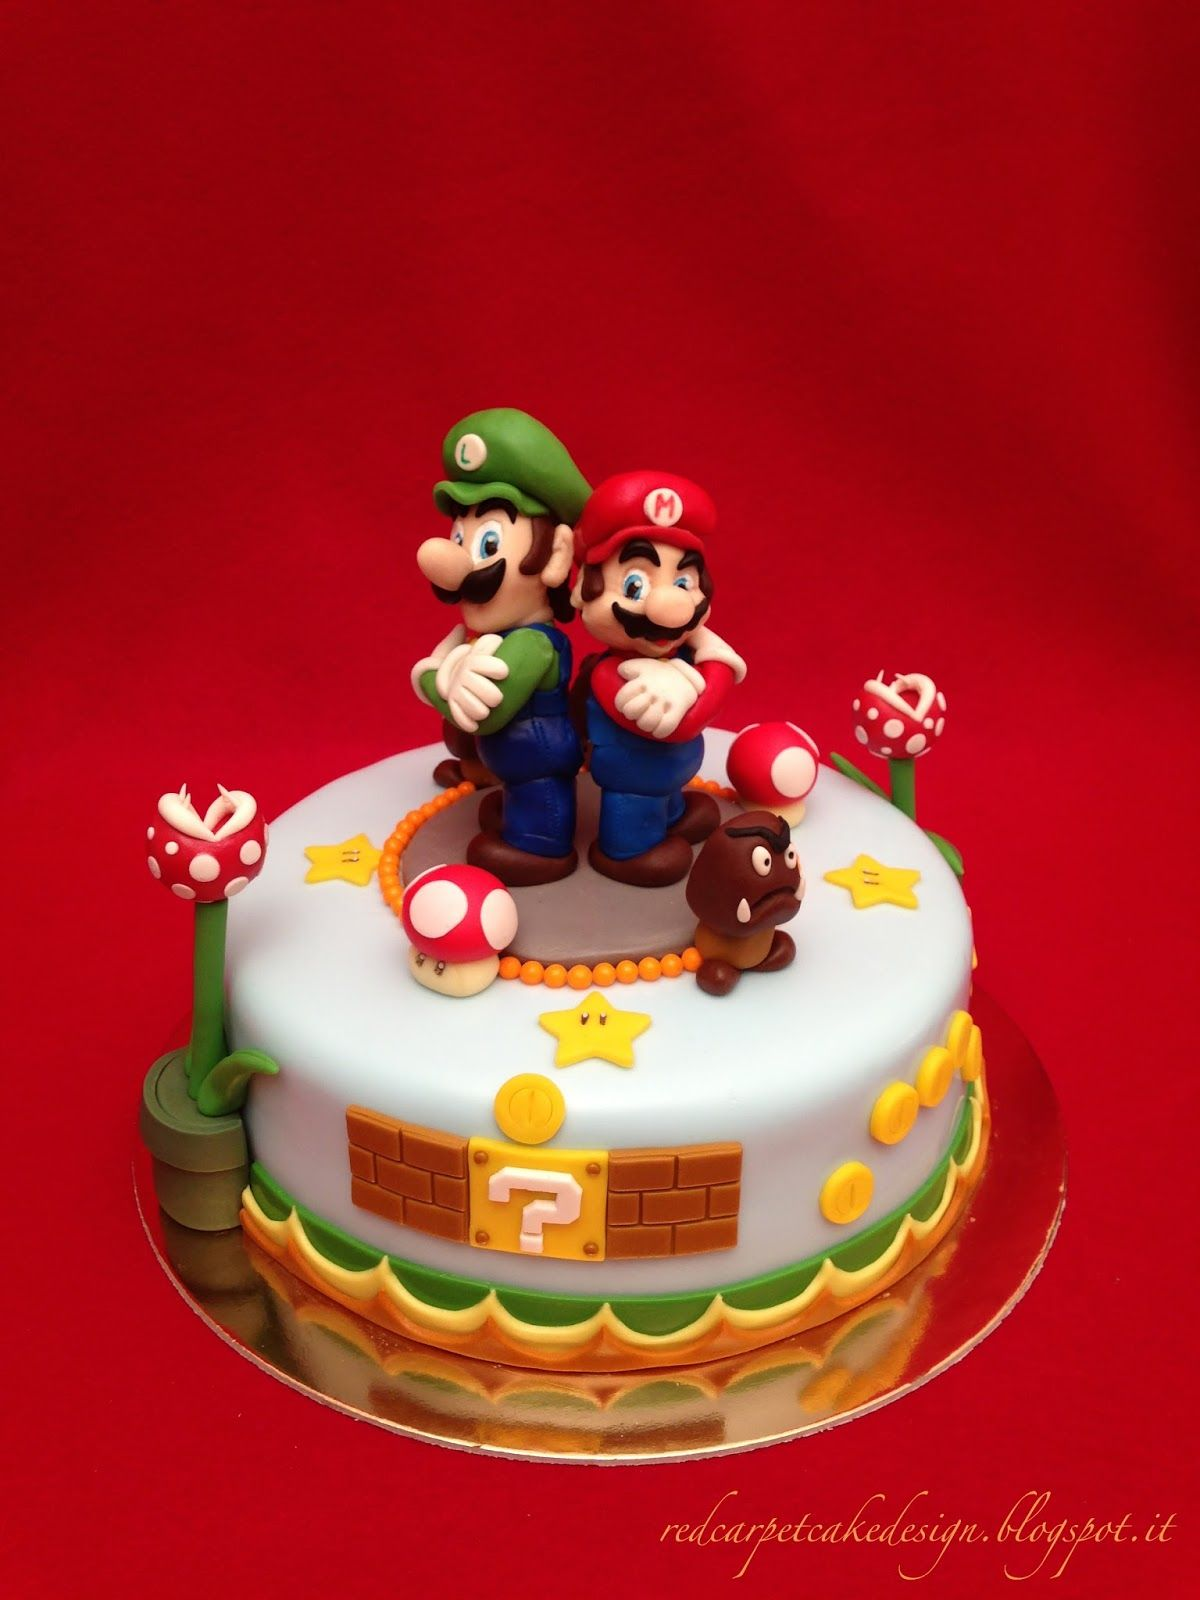 Super Mario Bros Cake By Red Carpet Cake Design